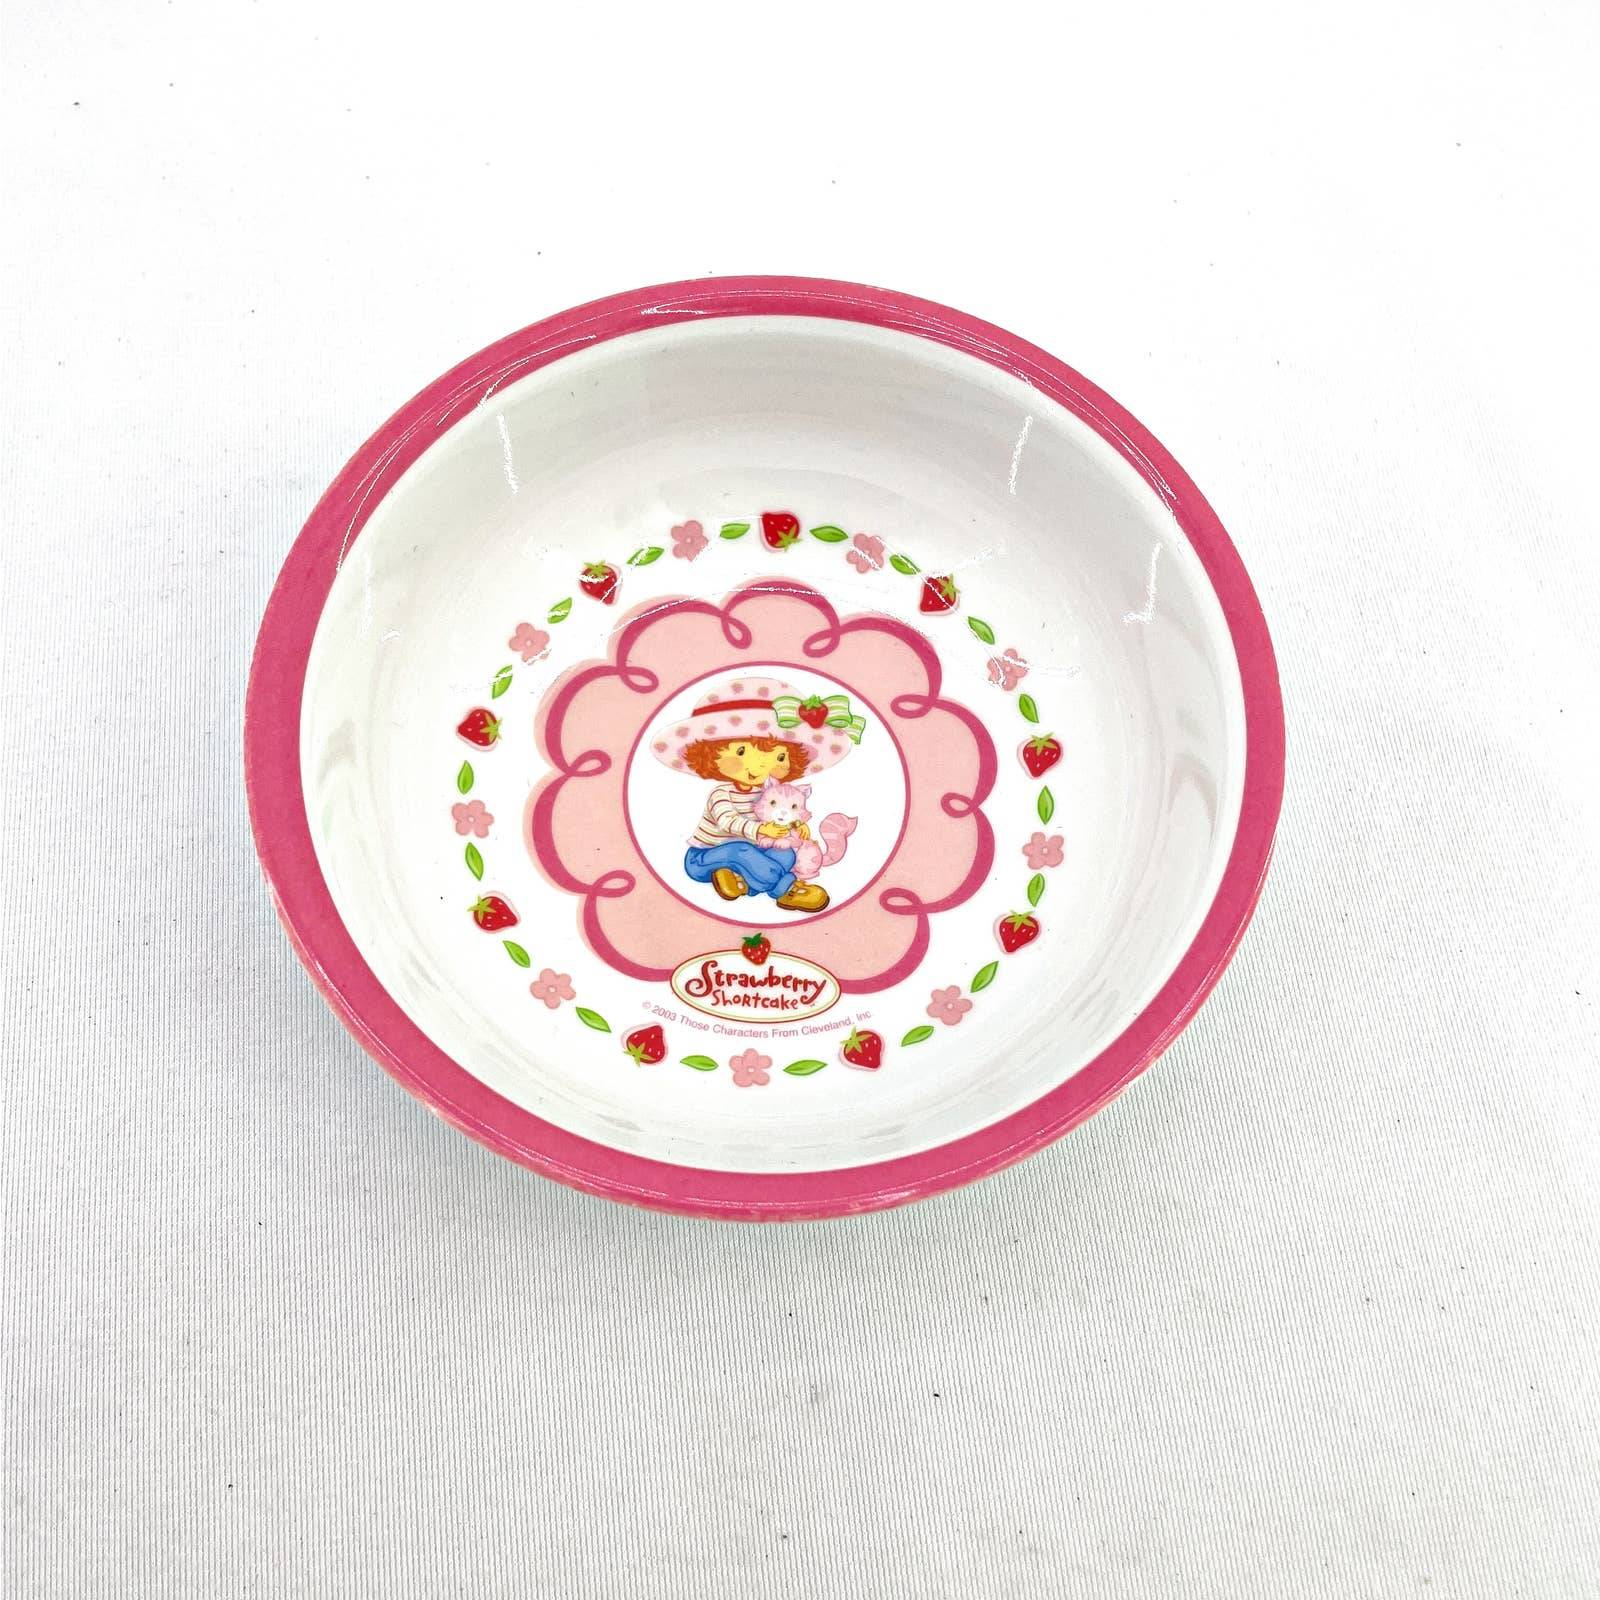 Strawberry Shortcake Zak Cereal Bowl